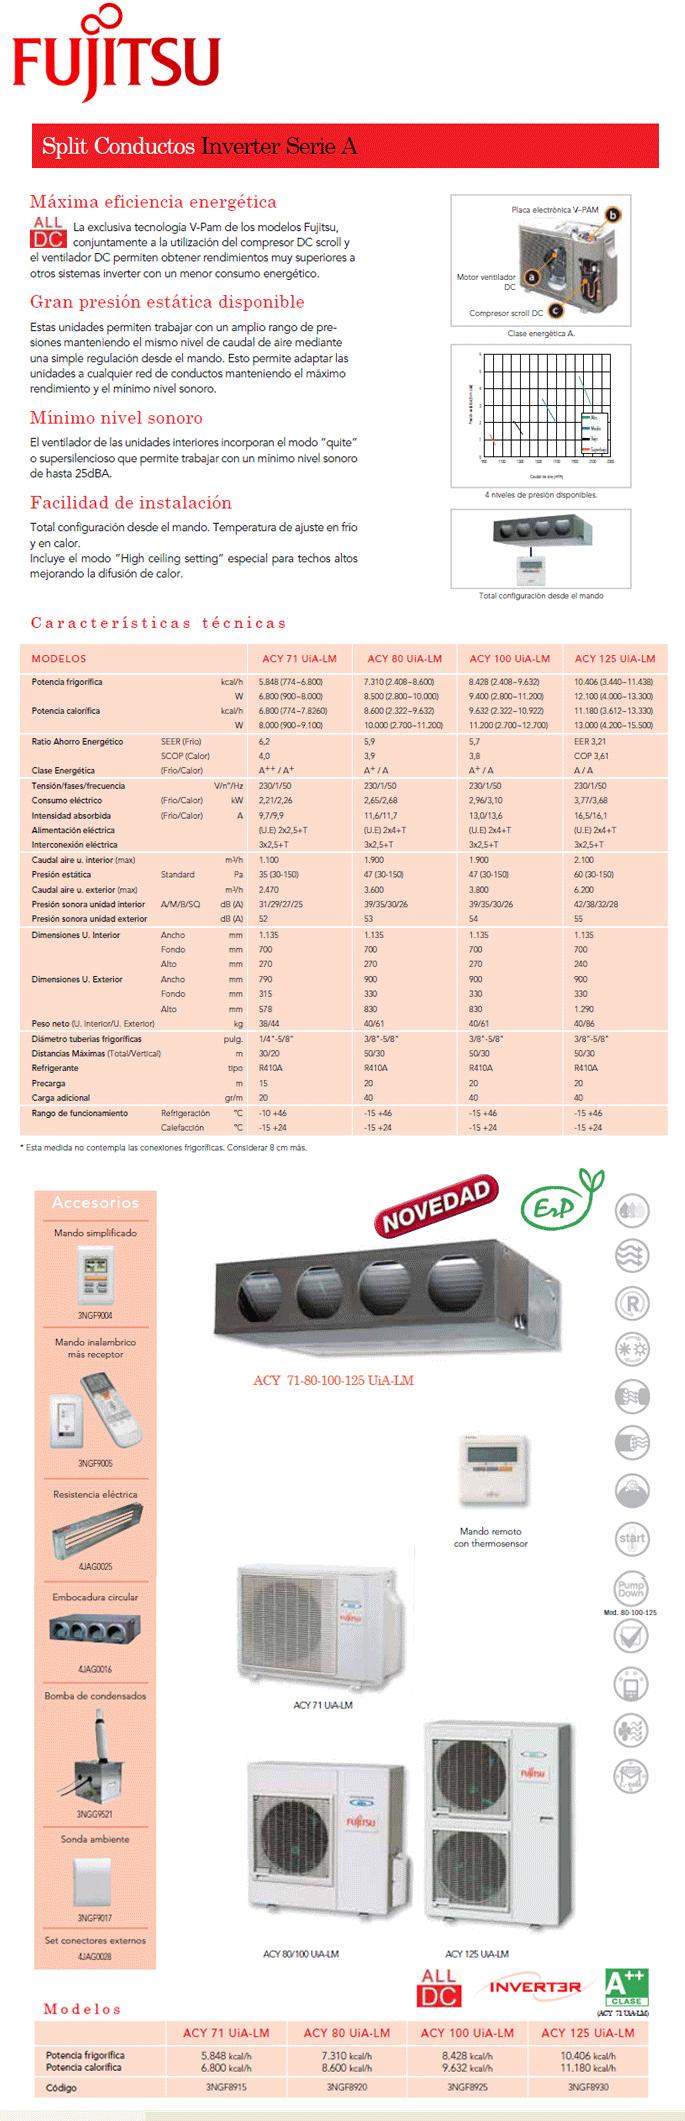 Fujitsu acy100uialm opiniones great aire fujitsu acyuialm - Aerotermia opiniones ...